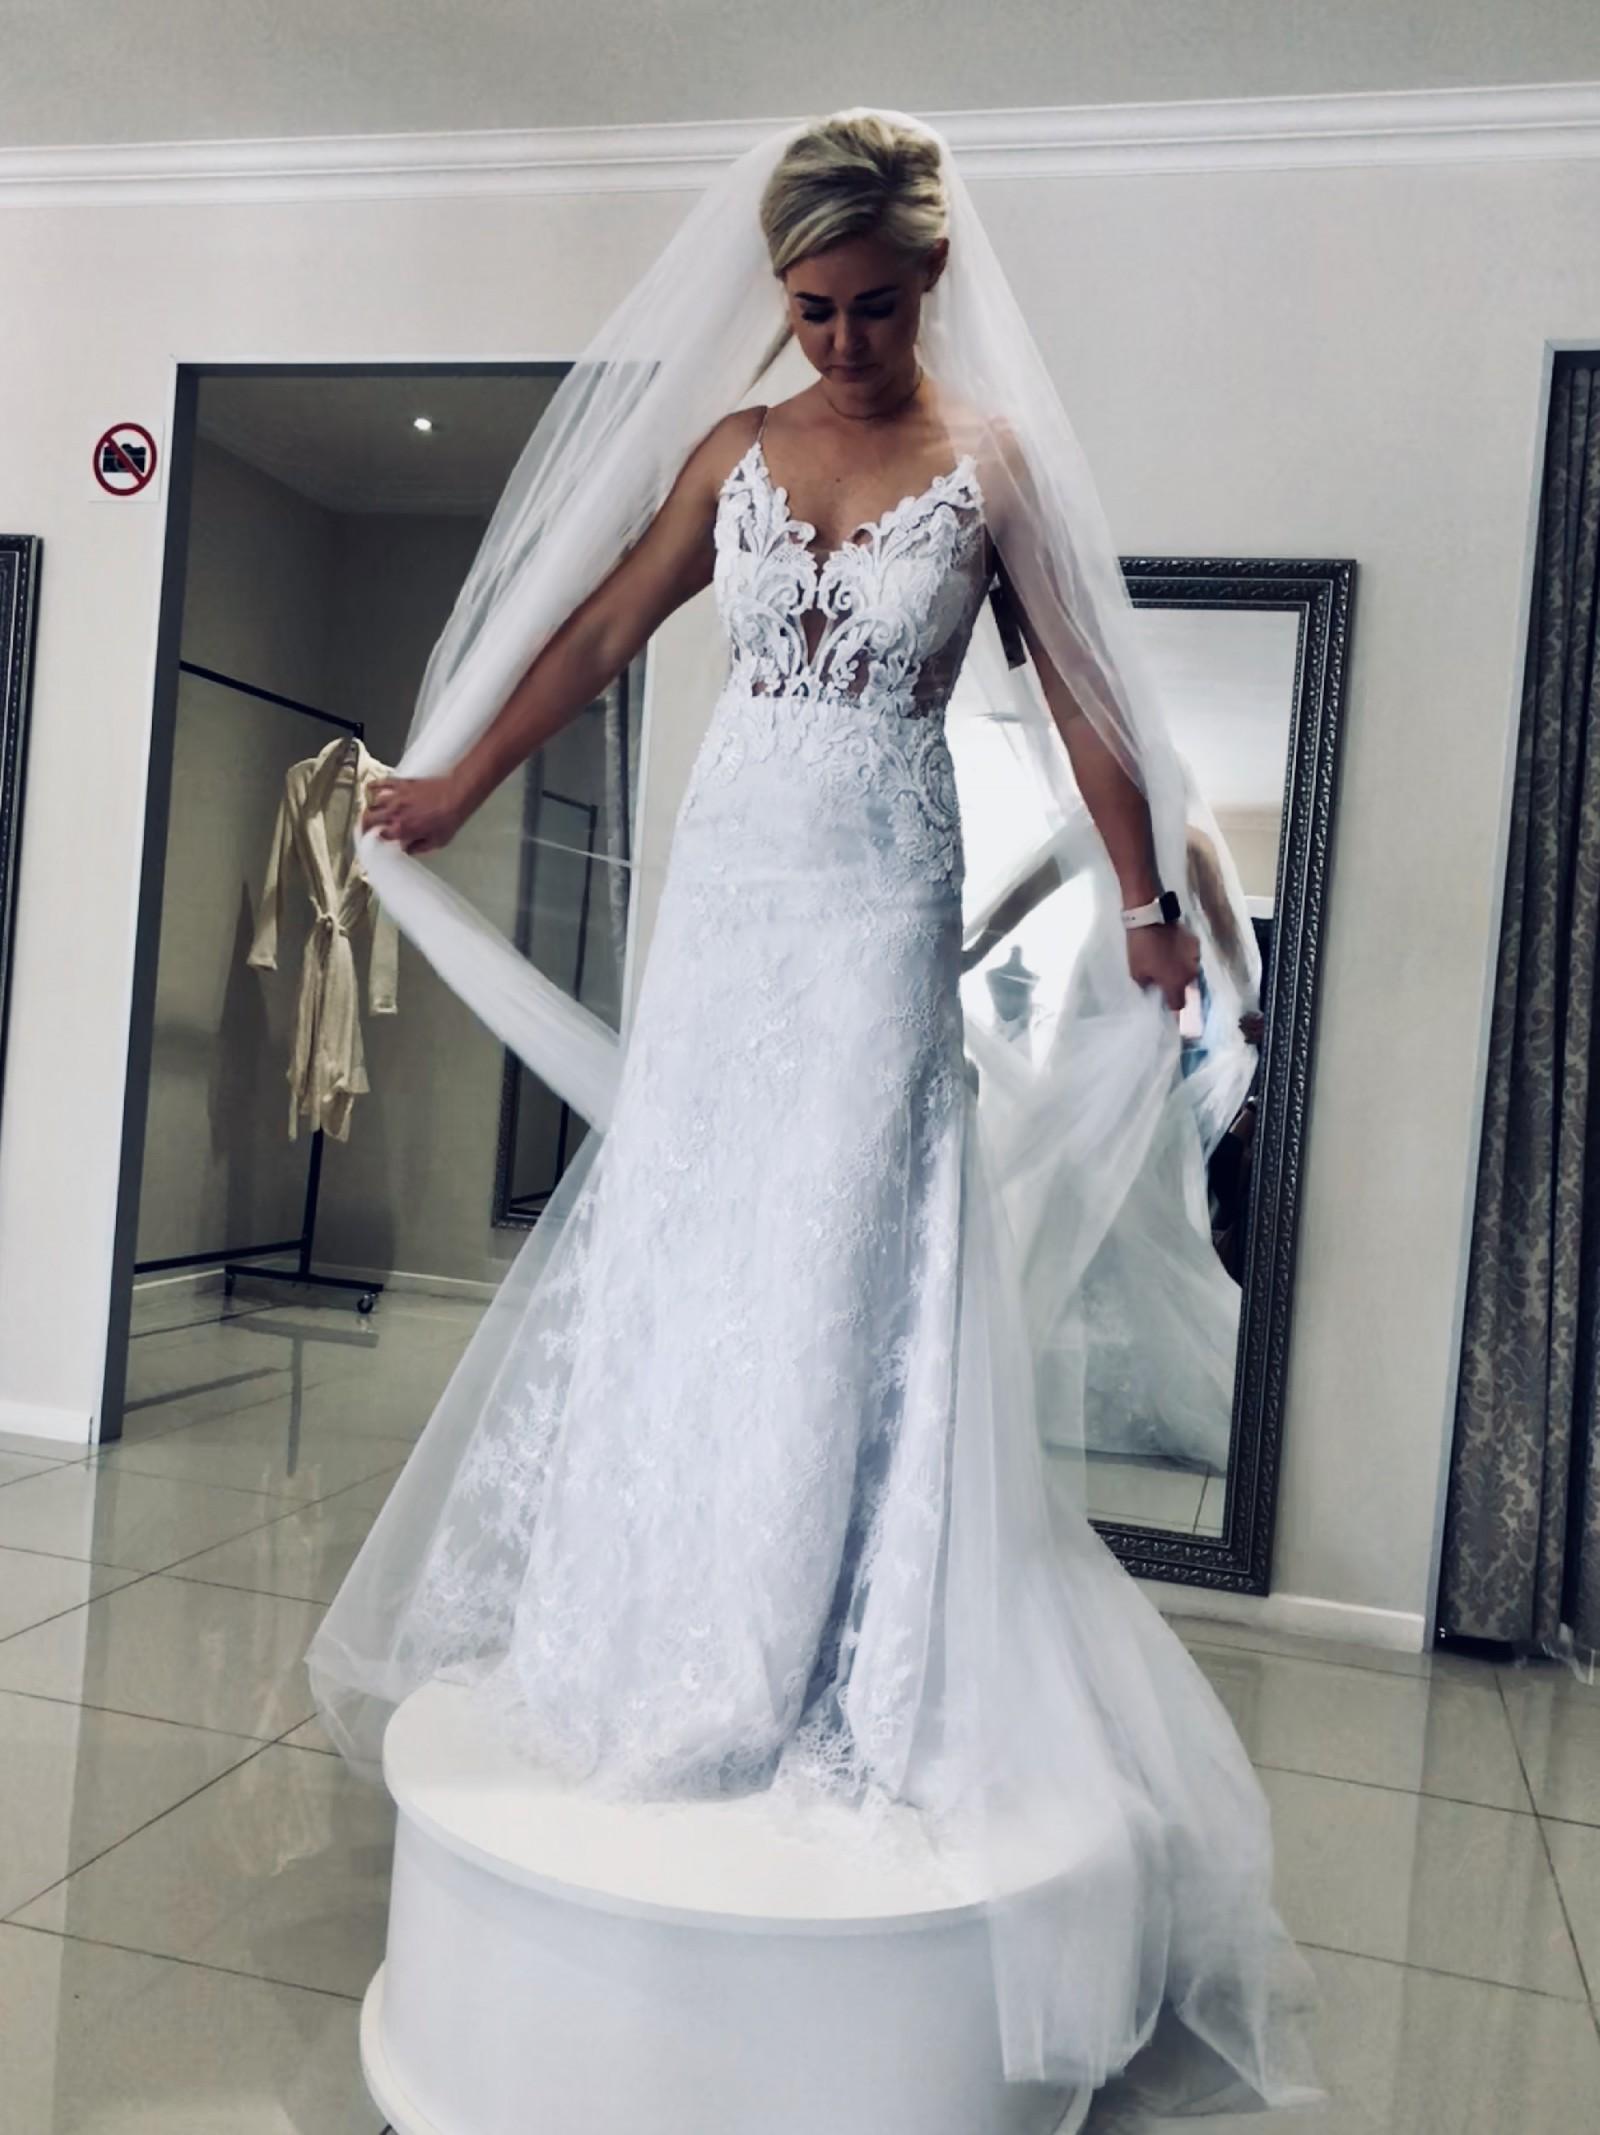 Cindy Bam New Wedding Dress On Sale 22 Off Stillwhite